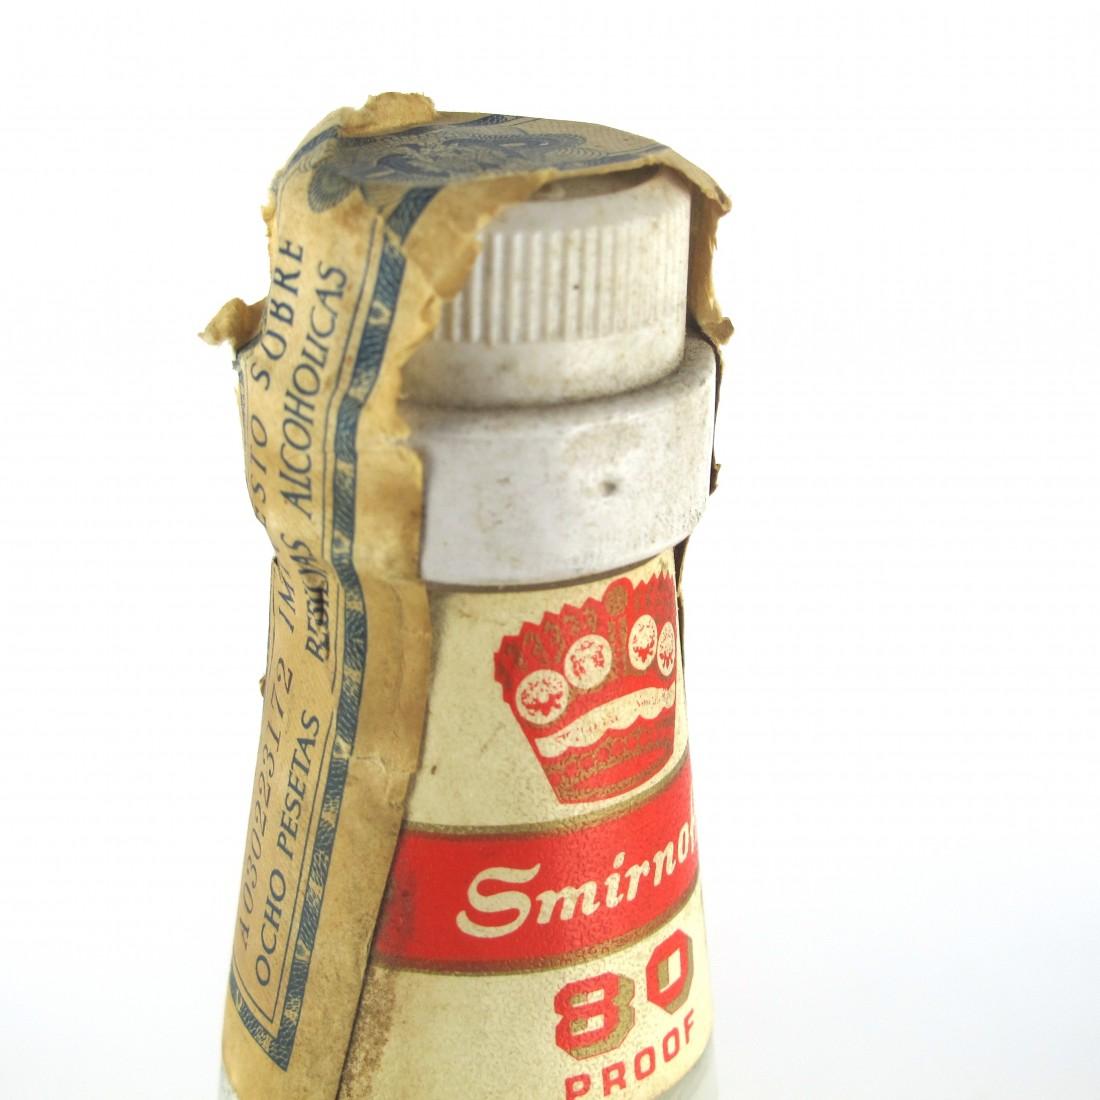 Smirnoff 80 Proof Vodka 1960s / Cinzano Import